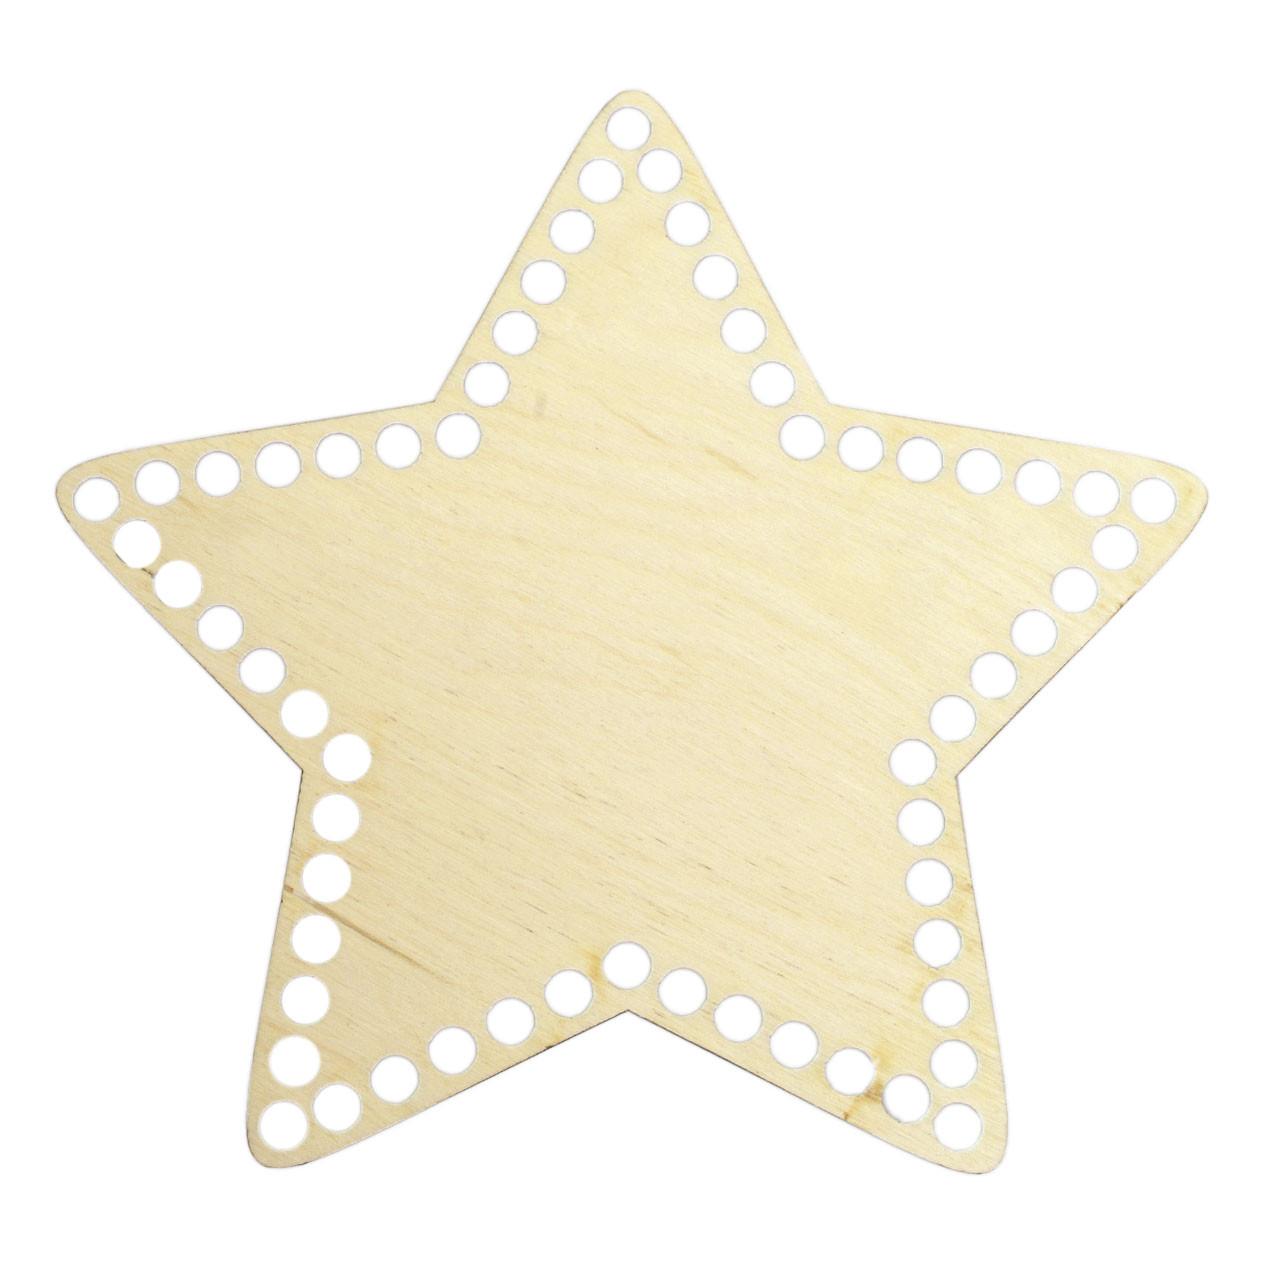 Донышко Звезда 20х20 см (Ø отверстие 8 мм)